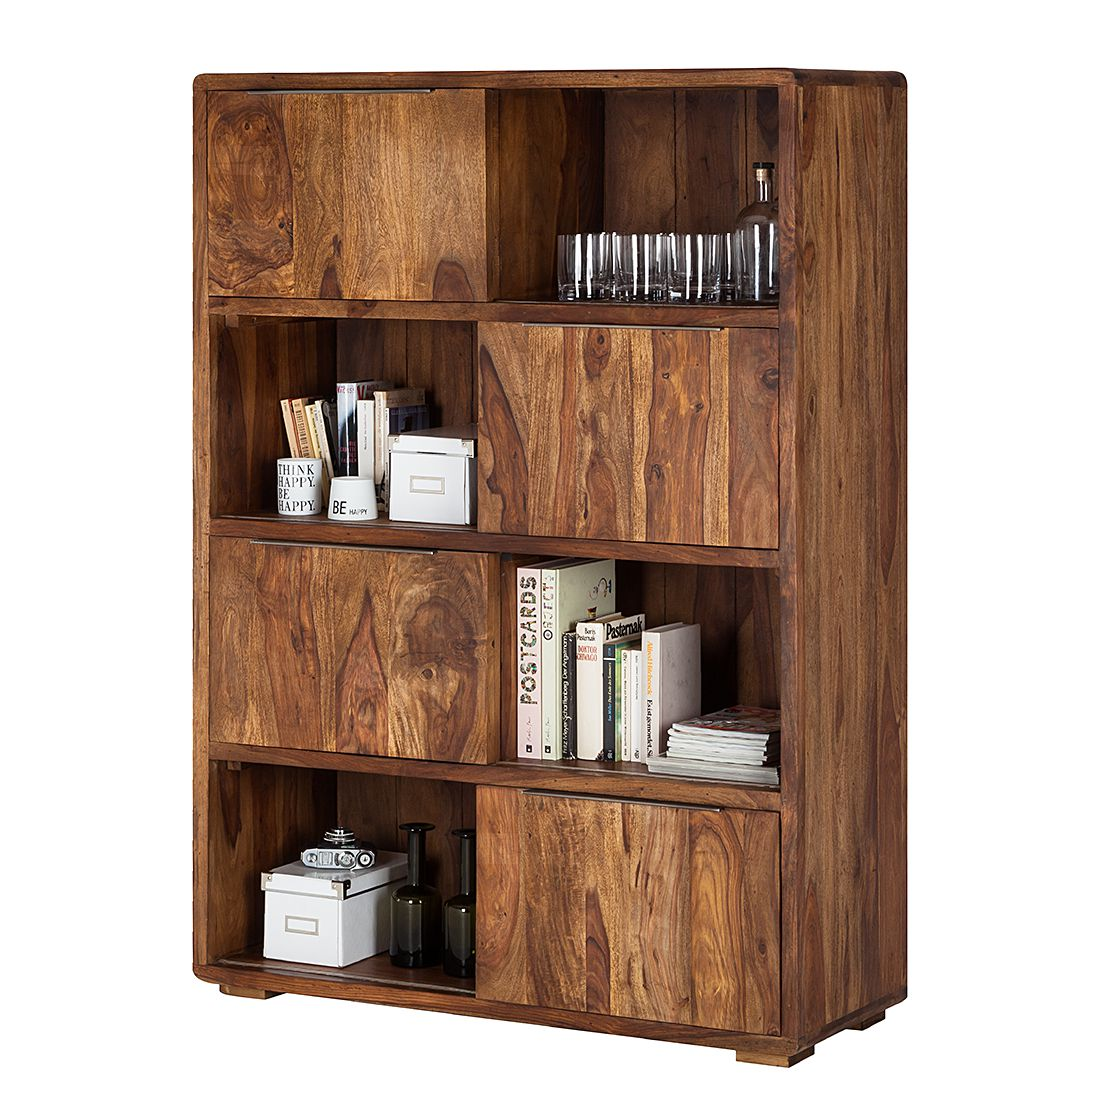 155 guide d 39 achat. Black Bedroom Furniture Sets. Home Design Ideas